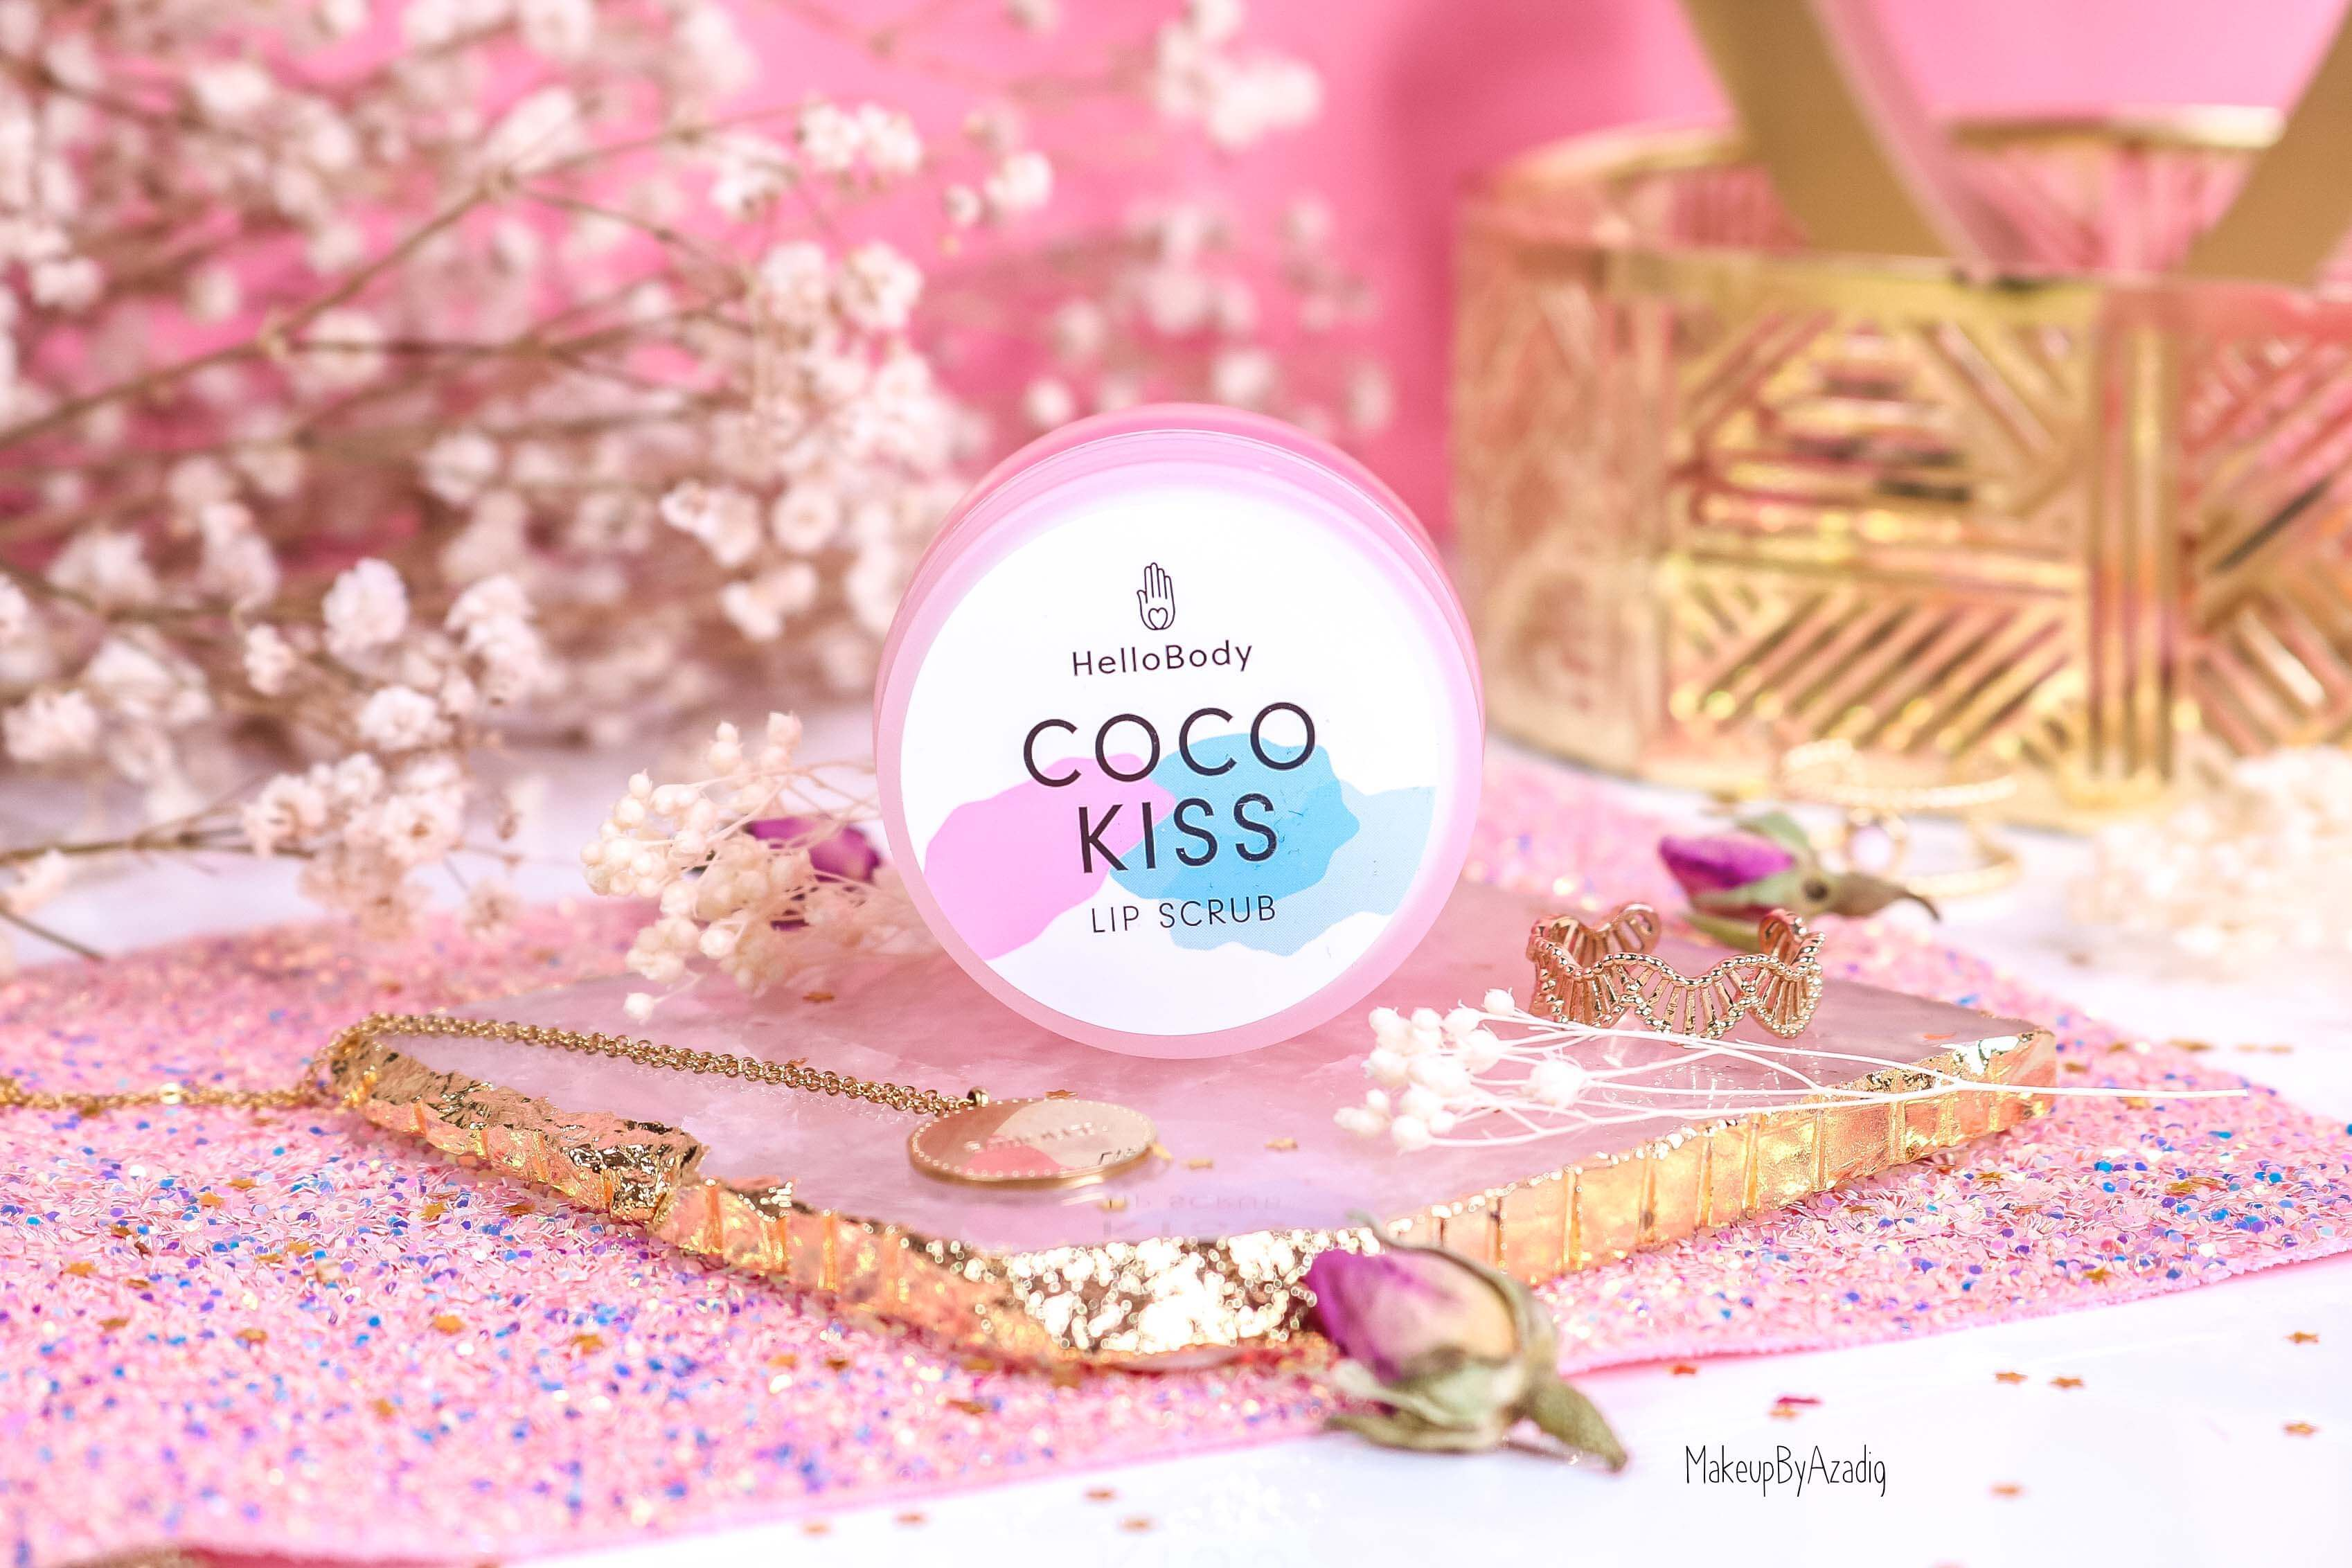 revue-baume-gommage-levres-coco-kiss-hellobody-avis-prix-swatch-makeupbyazadig-efficacite-lip-scrub-packaging